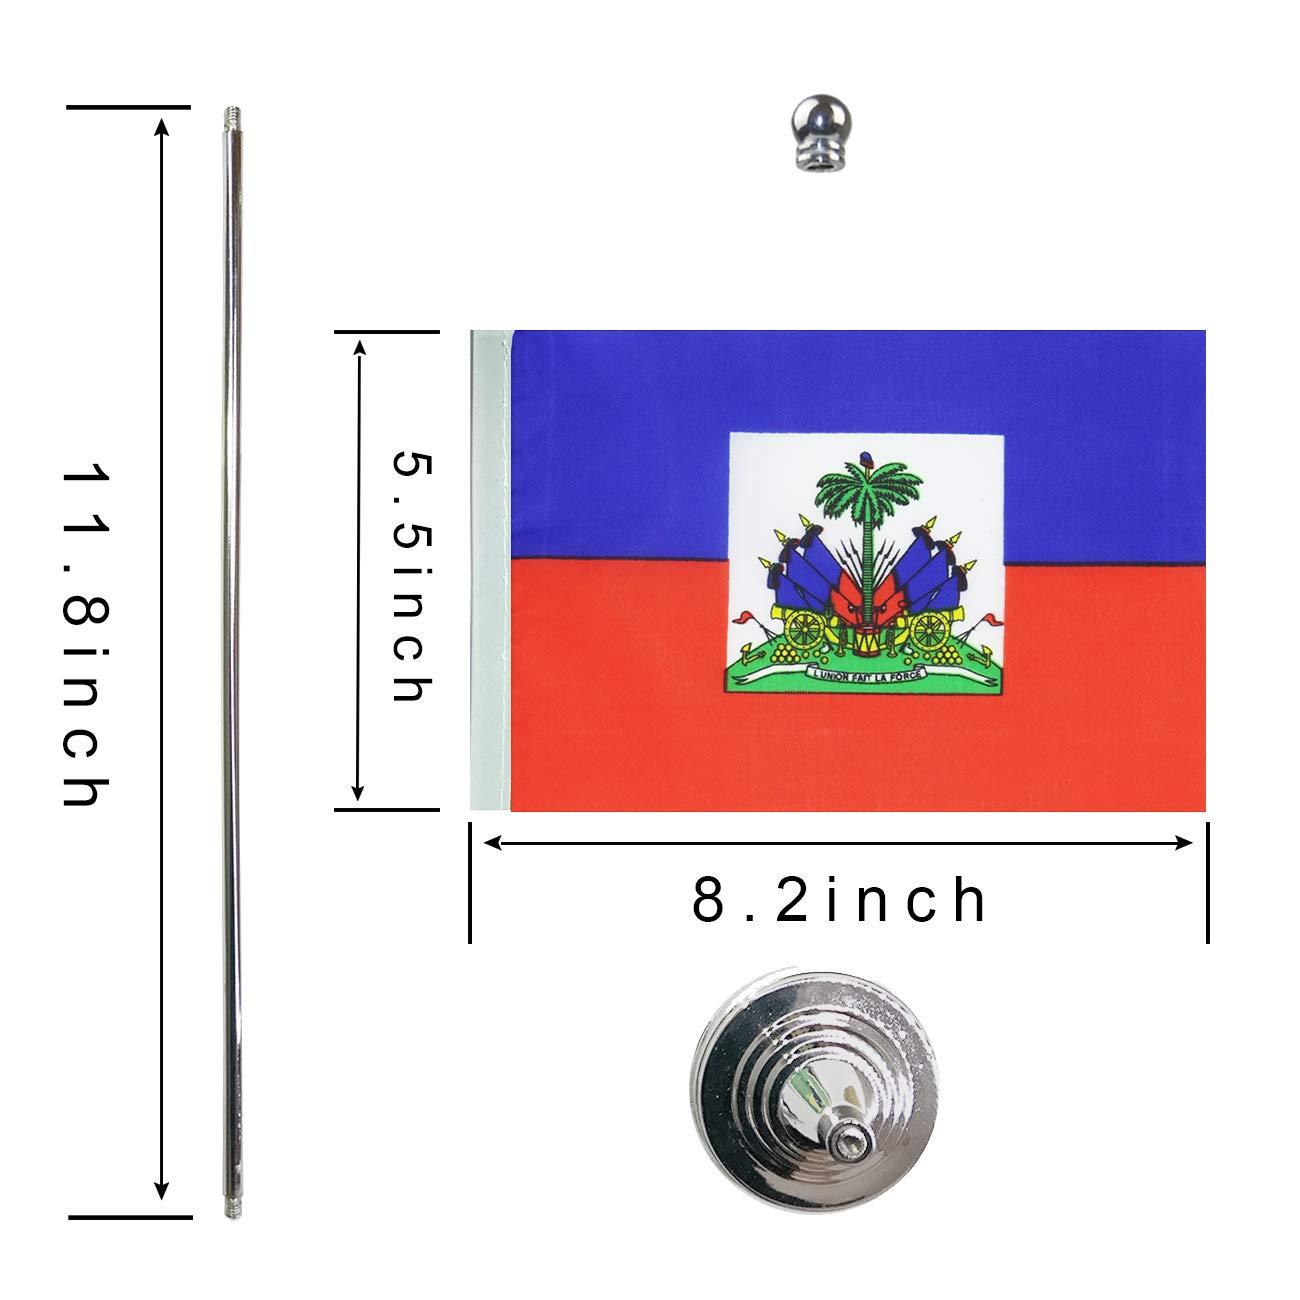 GentleGirl Dominica Flag Dominican Flag Table Flag,Desk Flag,Office Flag,International World Country Flags Banners,Festival Events Celebration,Office Decoration,Desk,Home Decoration